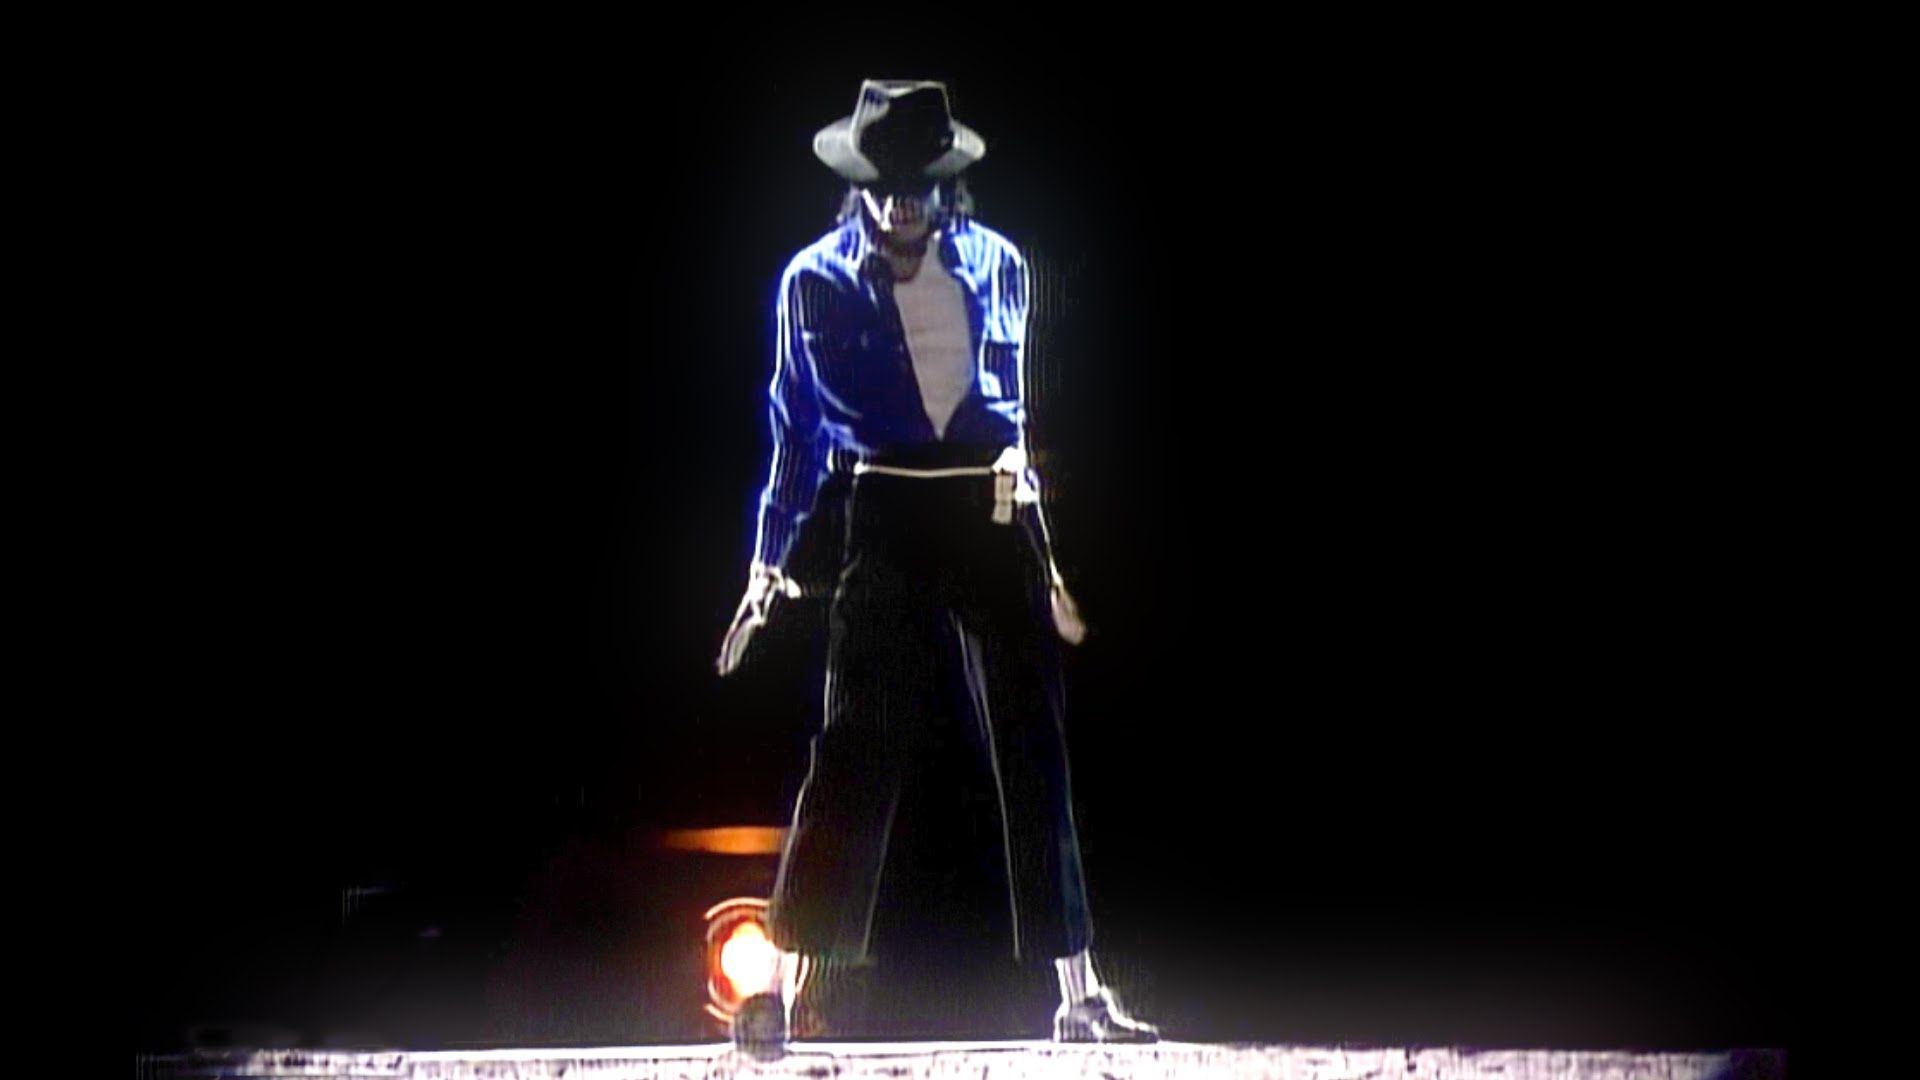 Michael Jackson Dangerous Wallpapers Top Free Michael Jackson